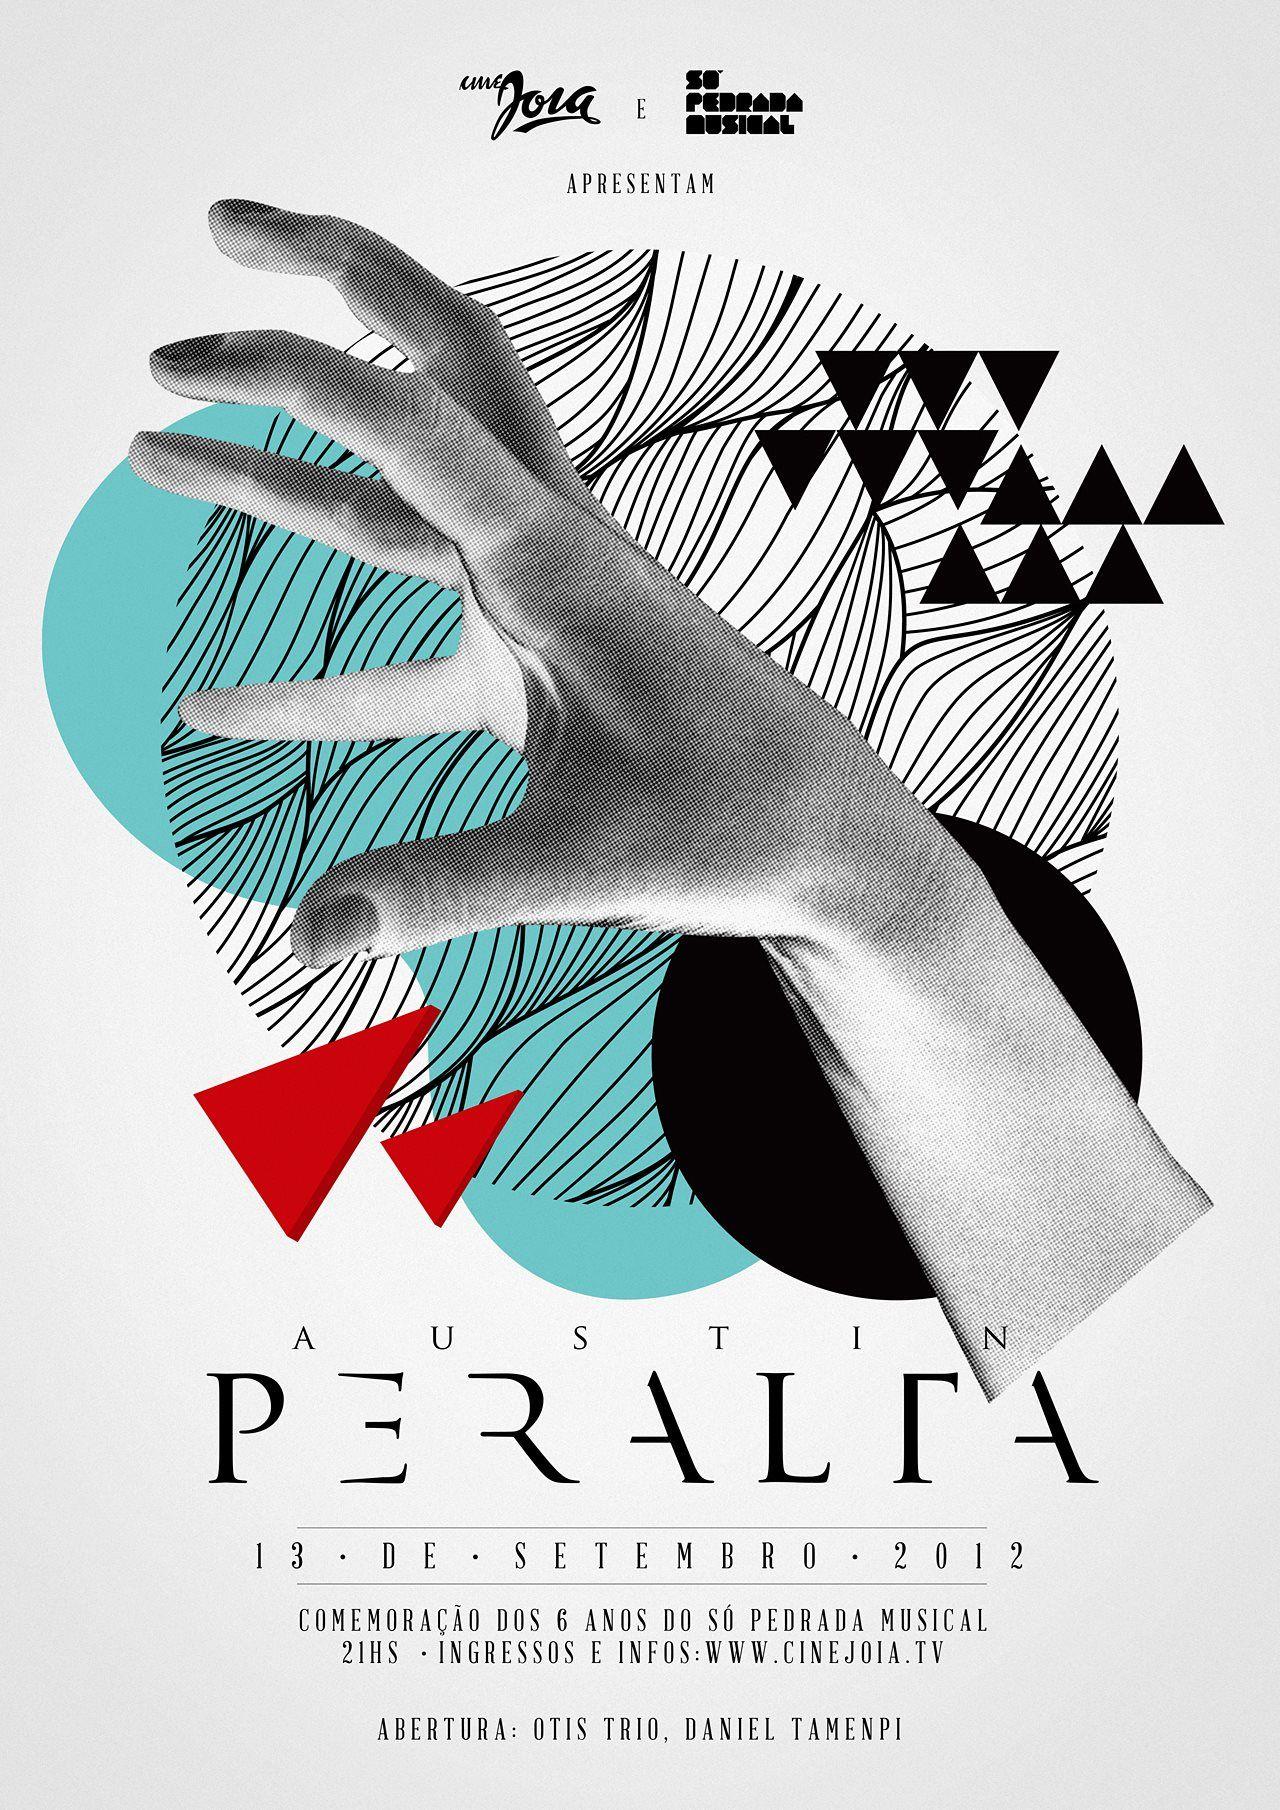 typographic poster design by austin peralta